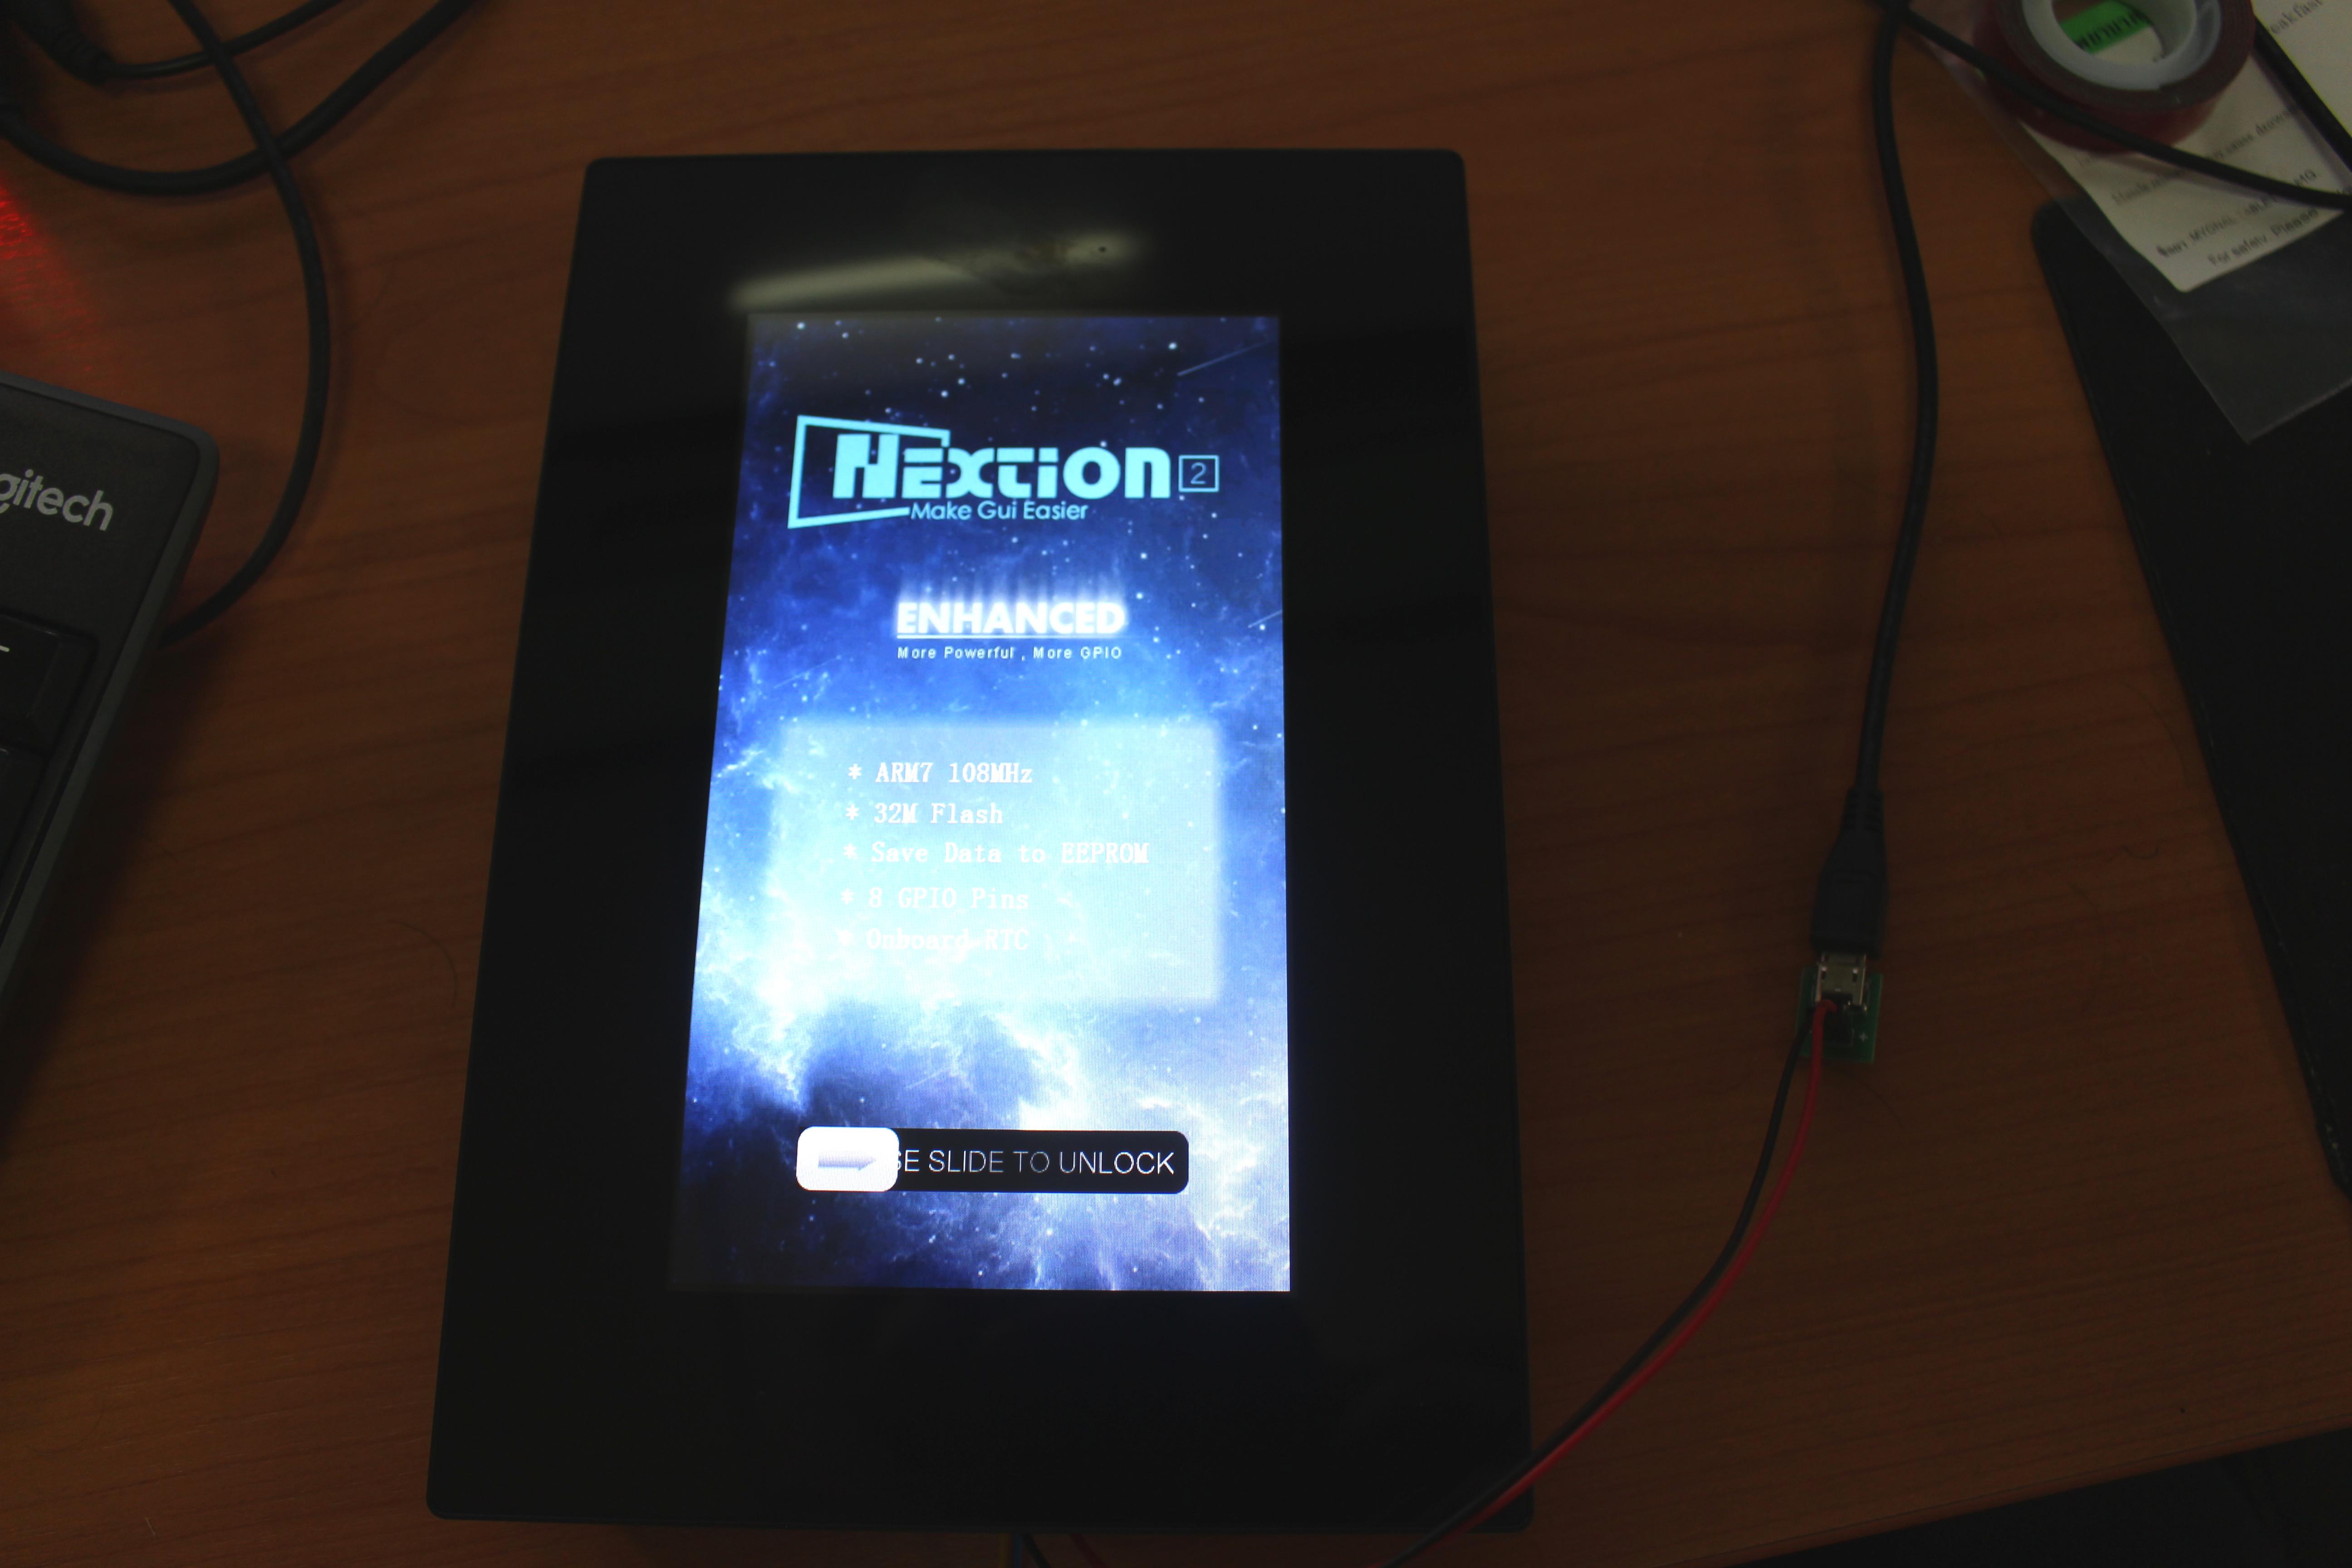 Mini Review of Nextion Enhanced NX8048K070 7